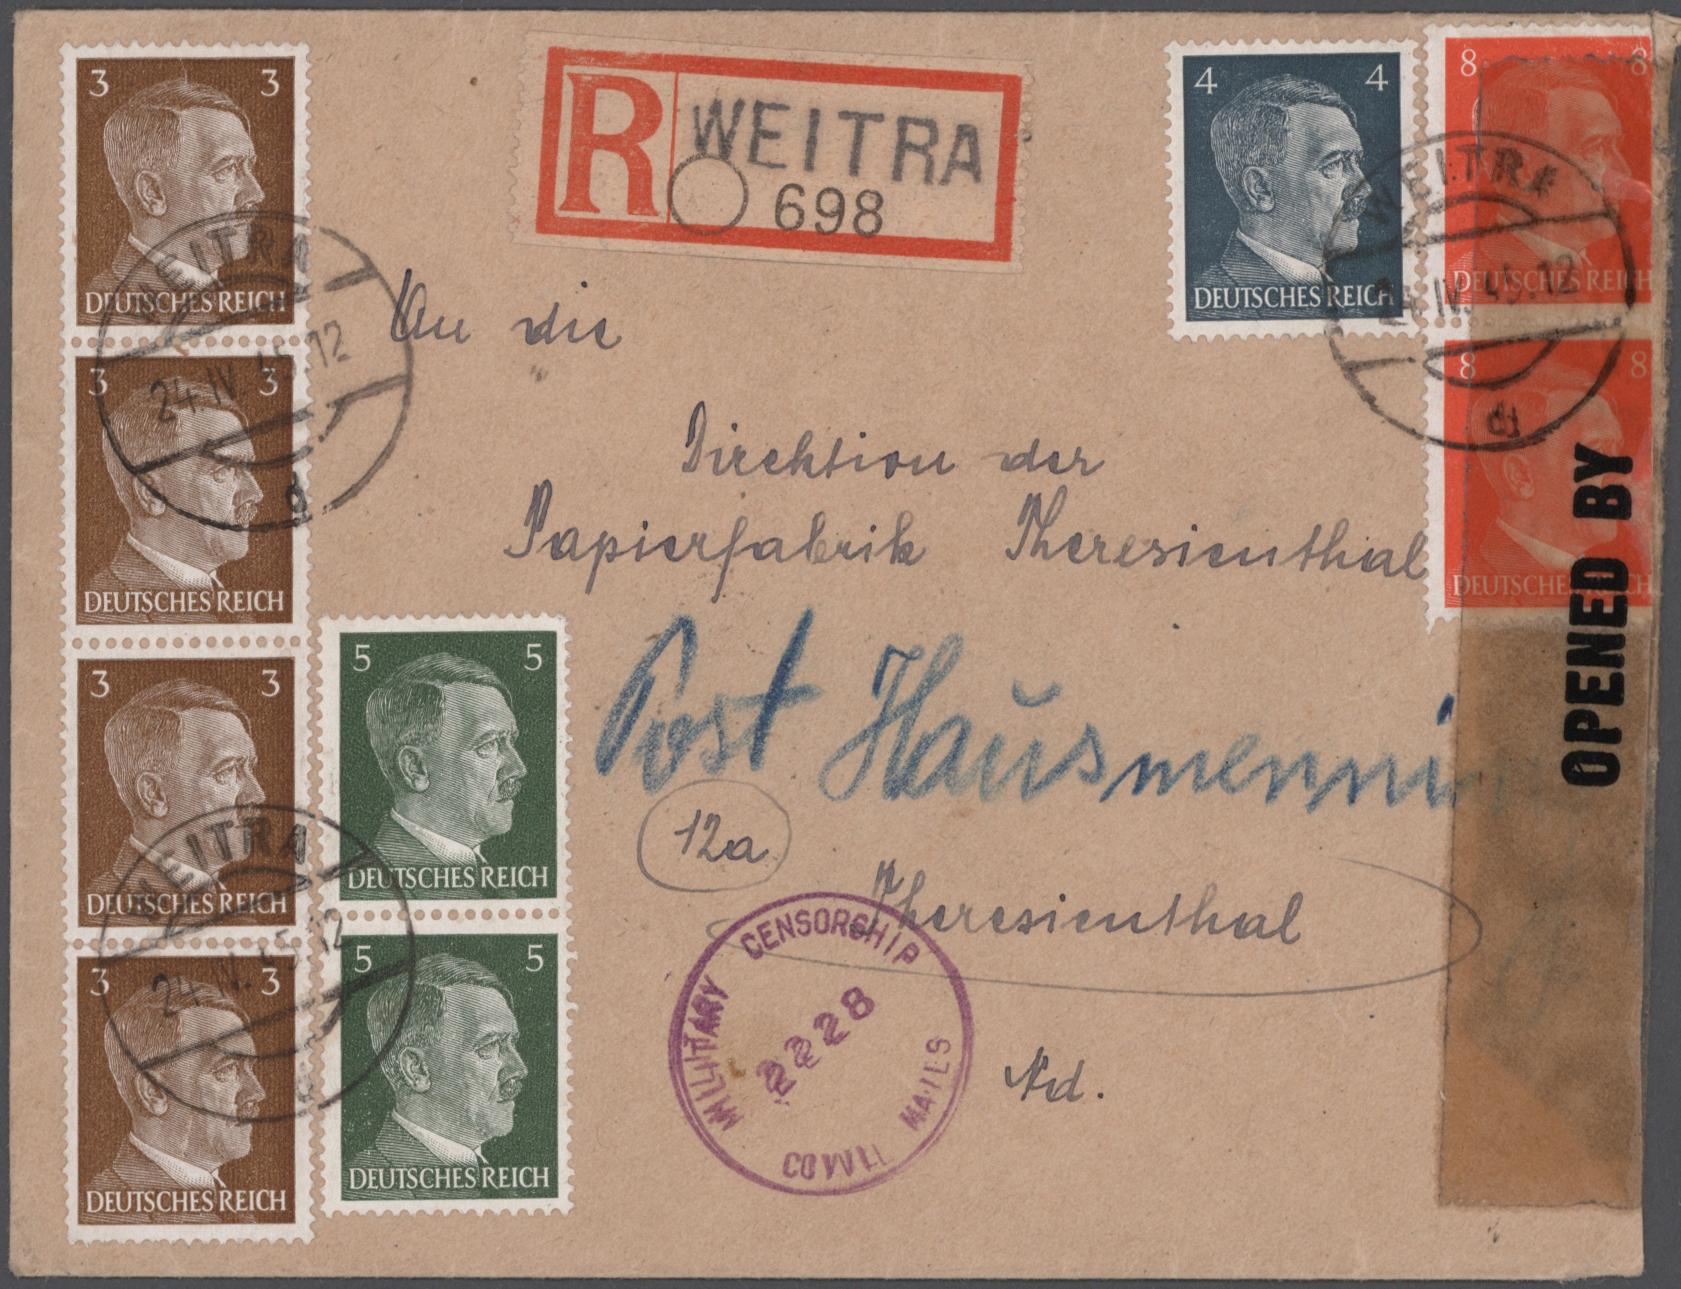 Lot 26294 - nachlässe  -  Auktionshaus Christoph Gärtner GmbH & Co. KG Sale #46 Gollcetions Germany - including the suplement